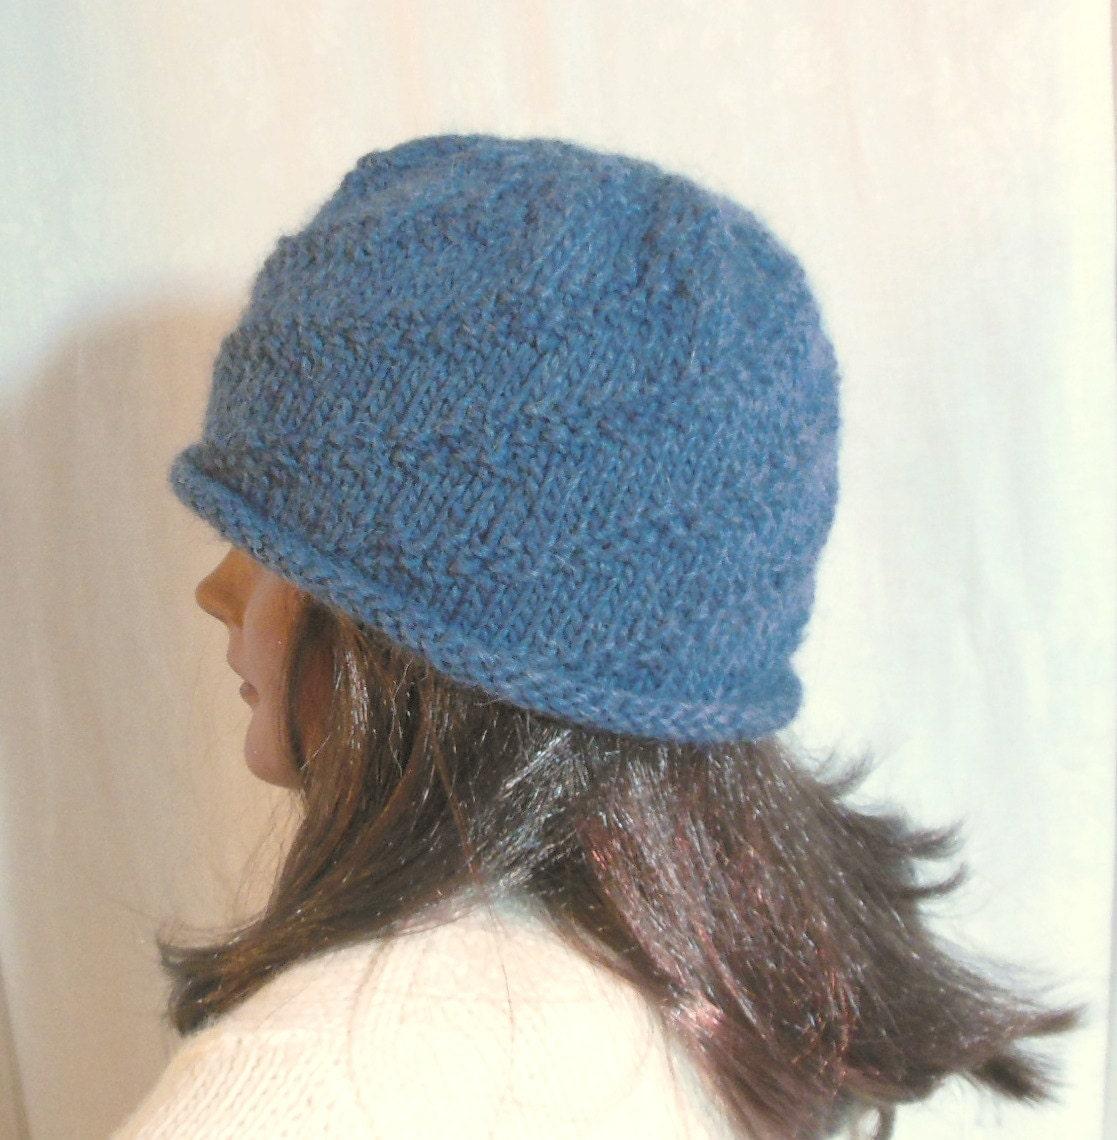 Knitting Pattern Swirl Hat : Hand knit beanie hat textured blue swirl wool ski cap watch